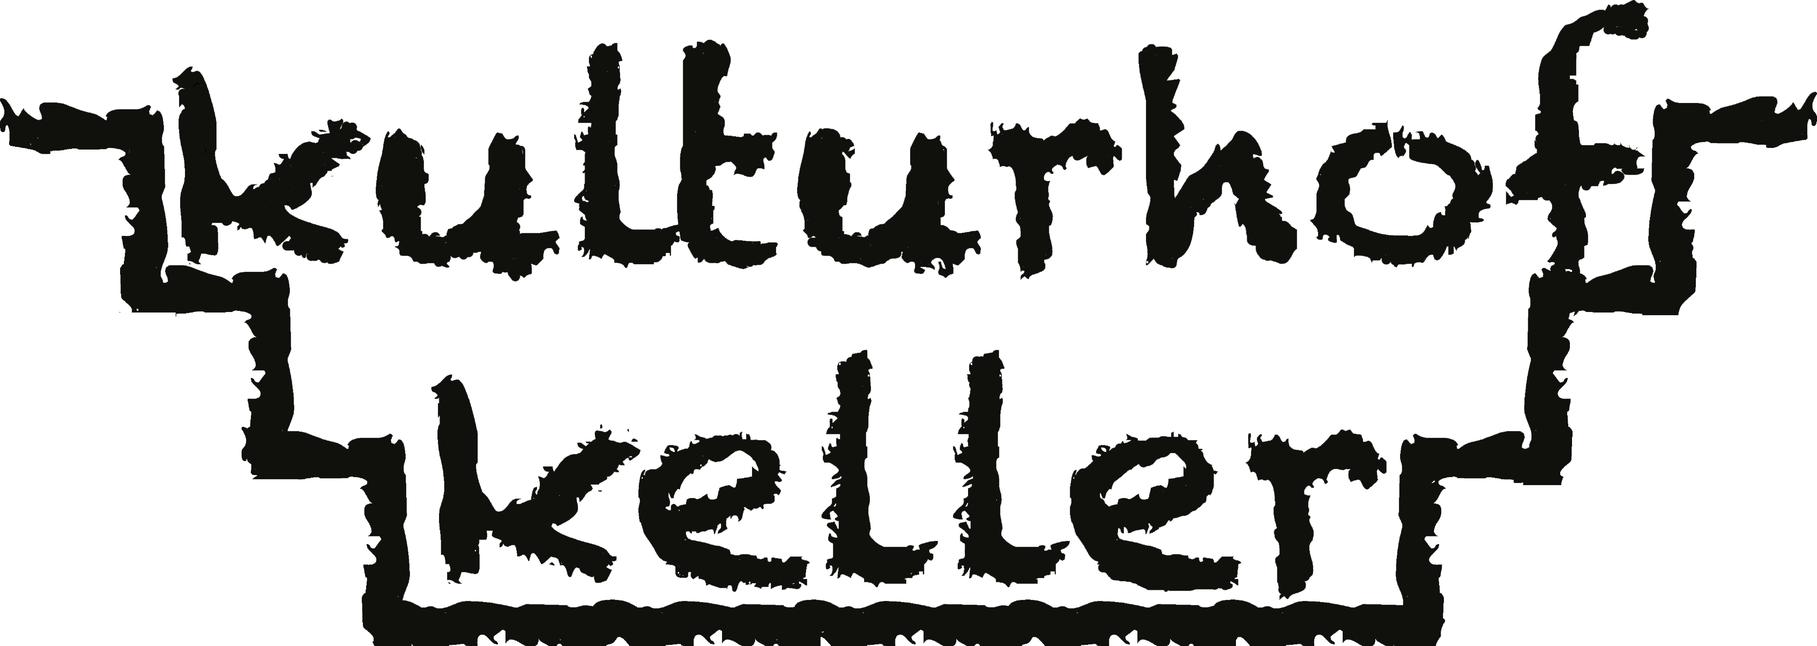 Kulturhof:keller 2011